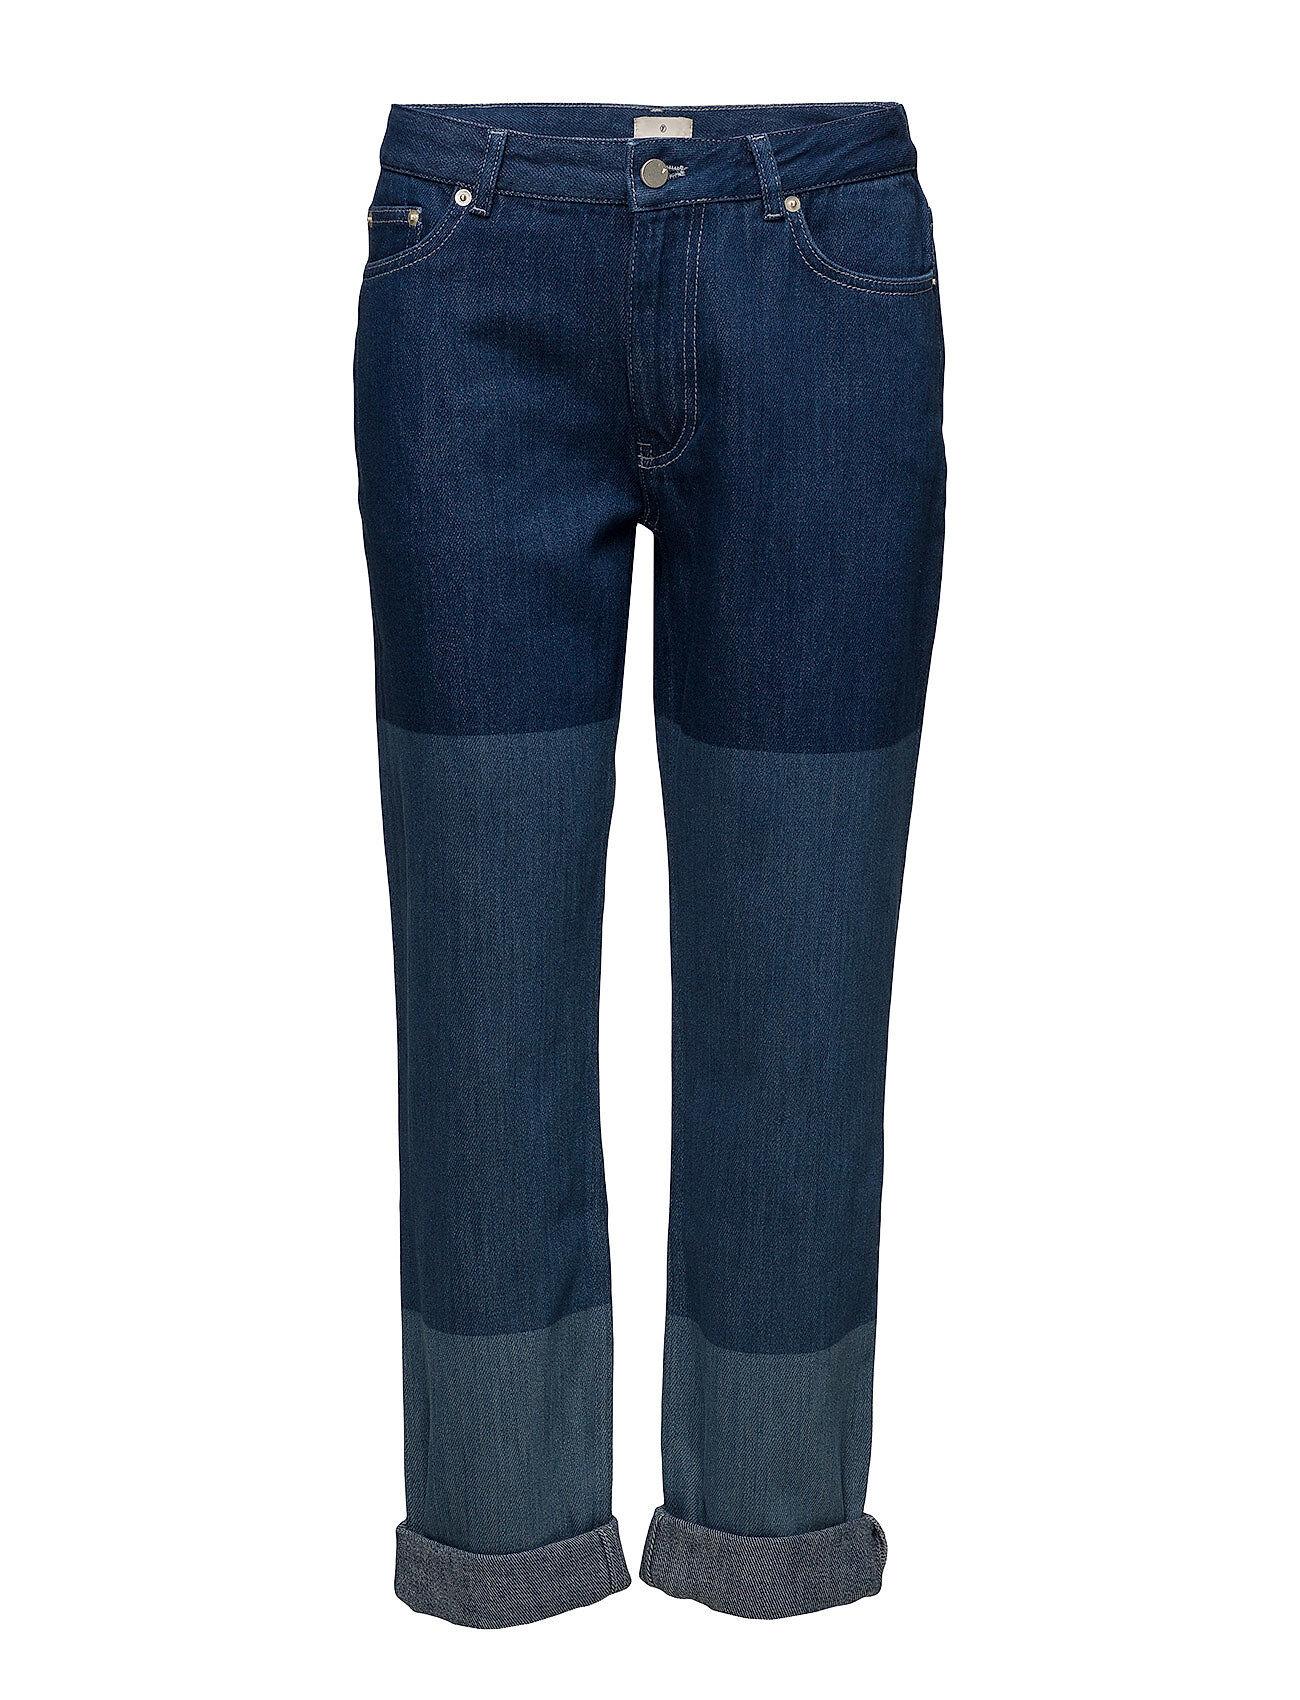 French Connection Boyfit Tri Shade Jeans Boyfriend Farkut Sininen French Connection